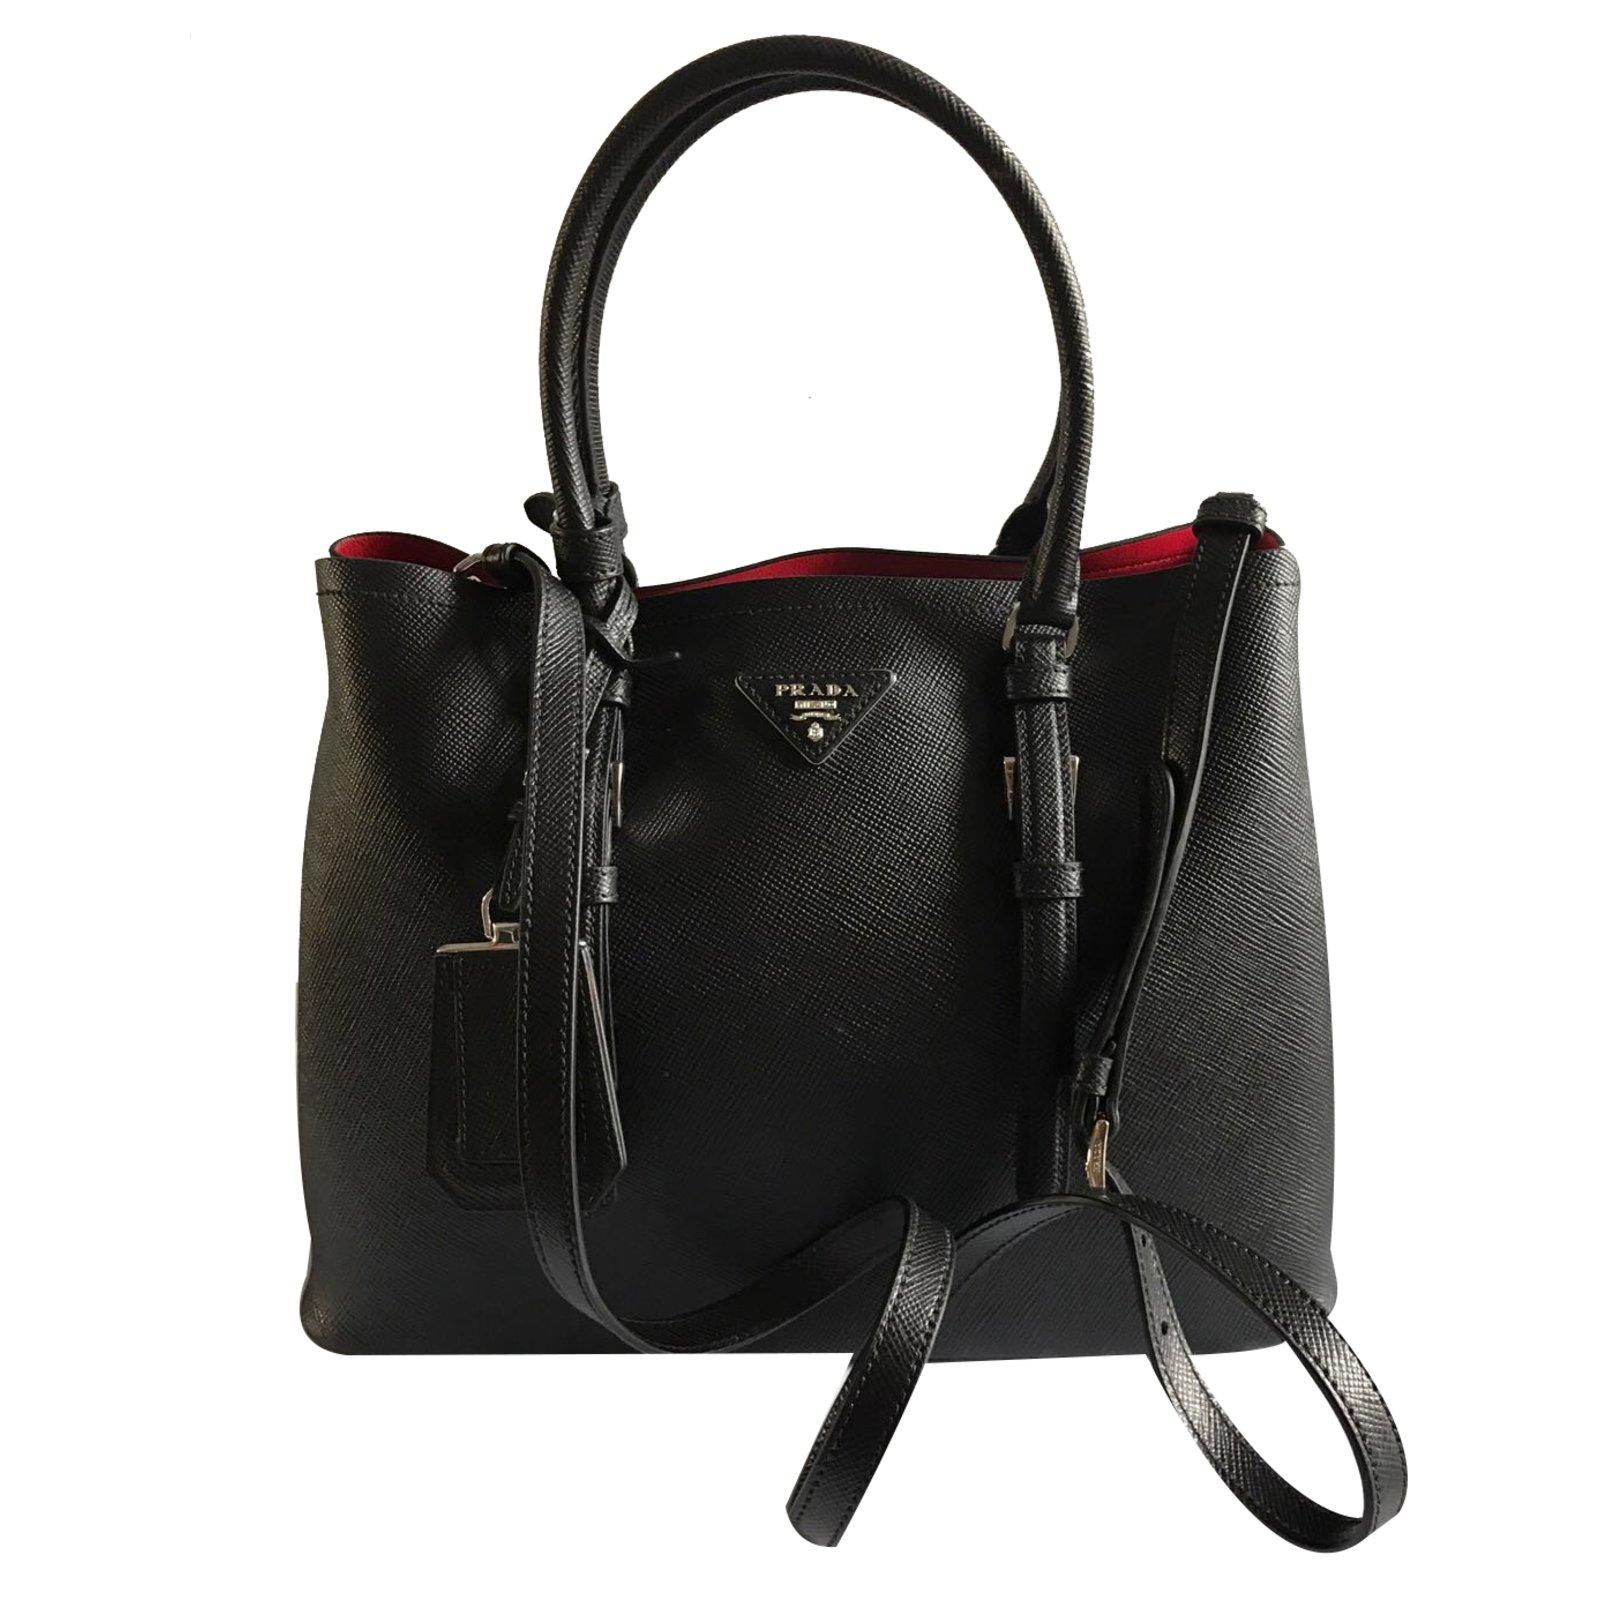 prada double bag handbags leather black joli. Black Bedroom Furniture Sets. Home Design Ideas